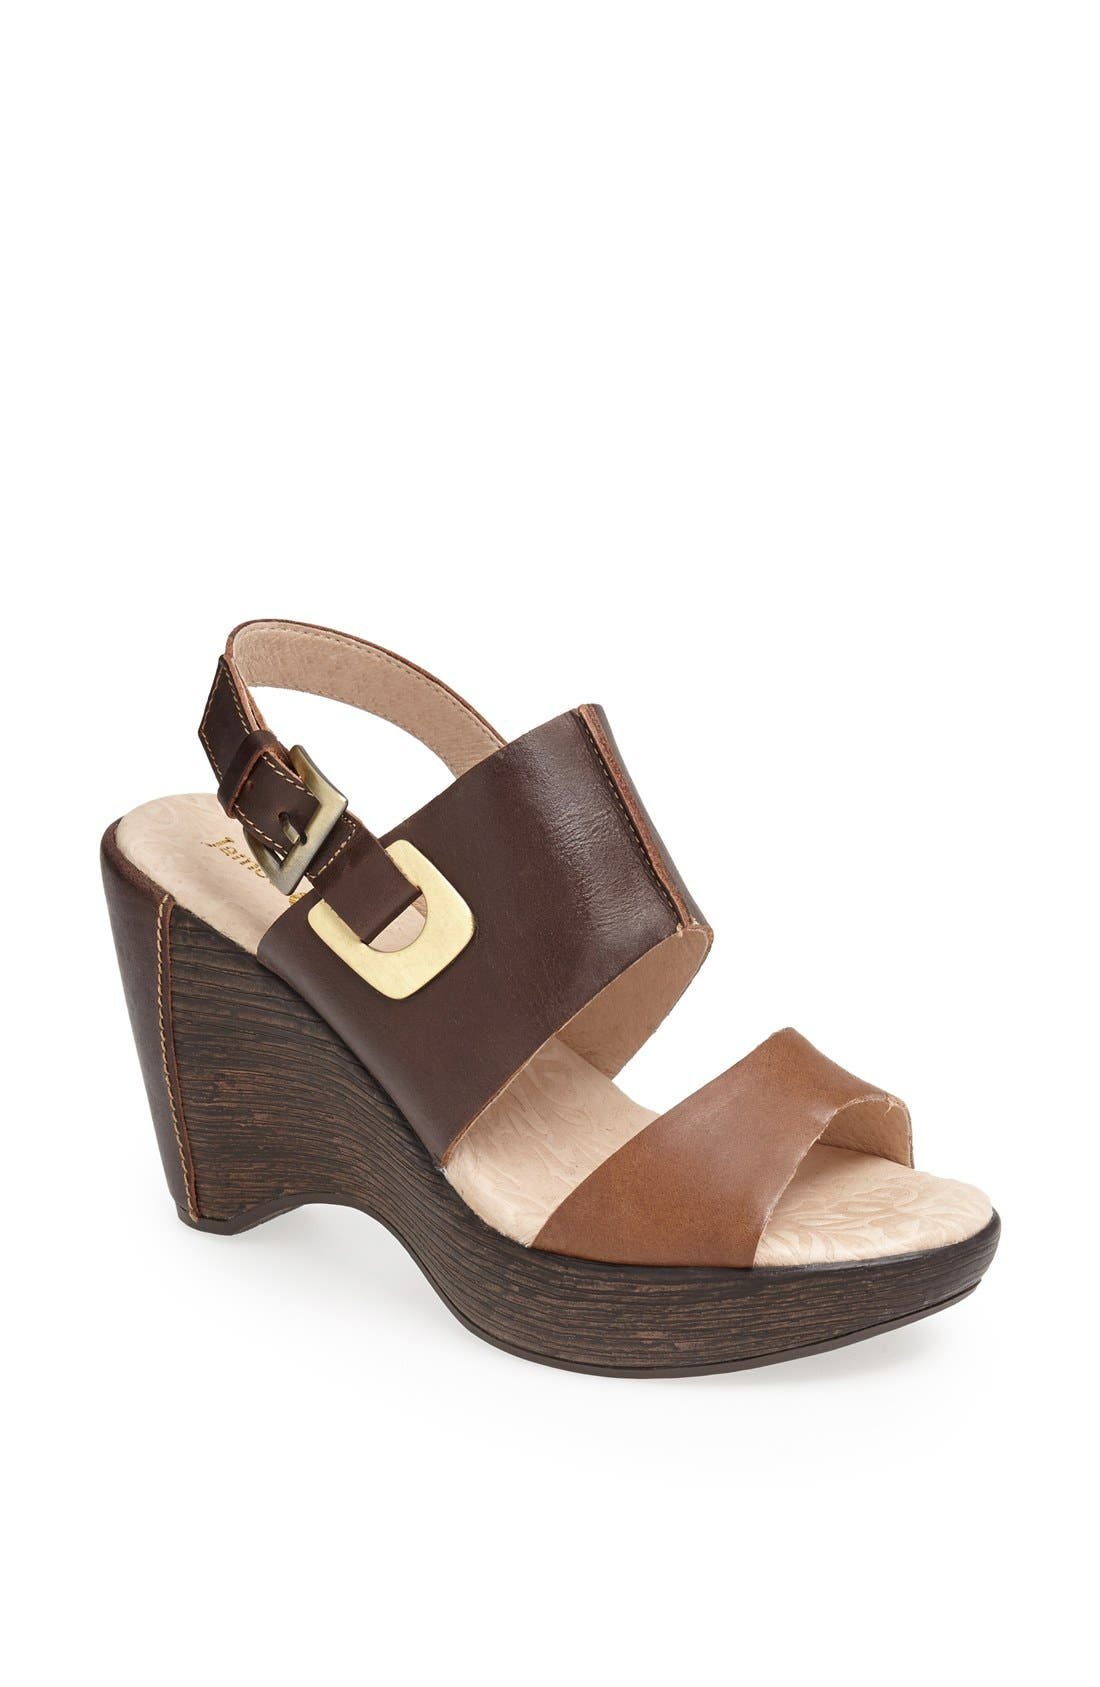 Alternate Image 1 Selected - Jambu 'Gem' Sandal